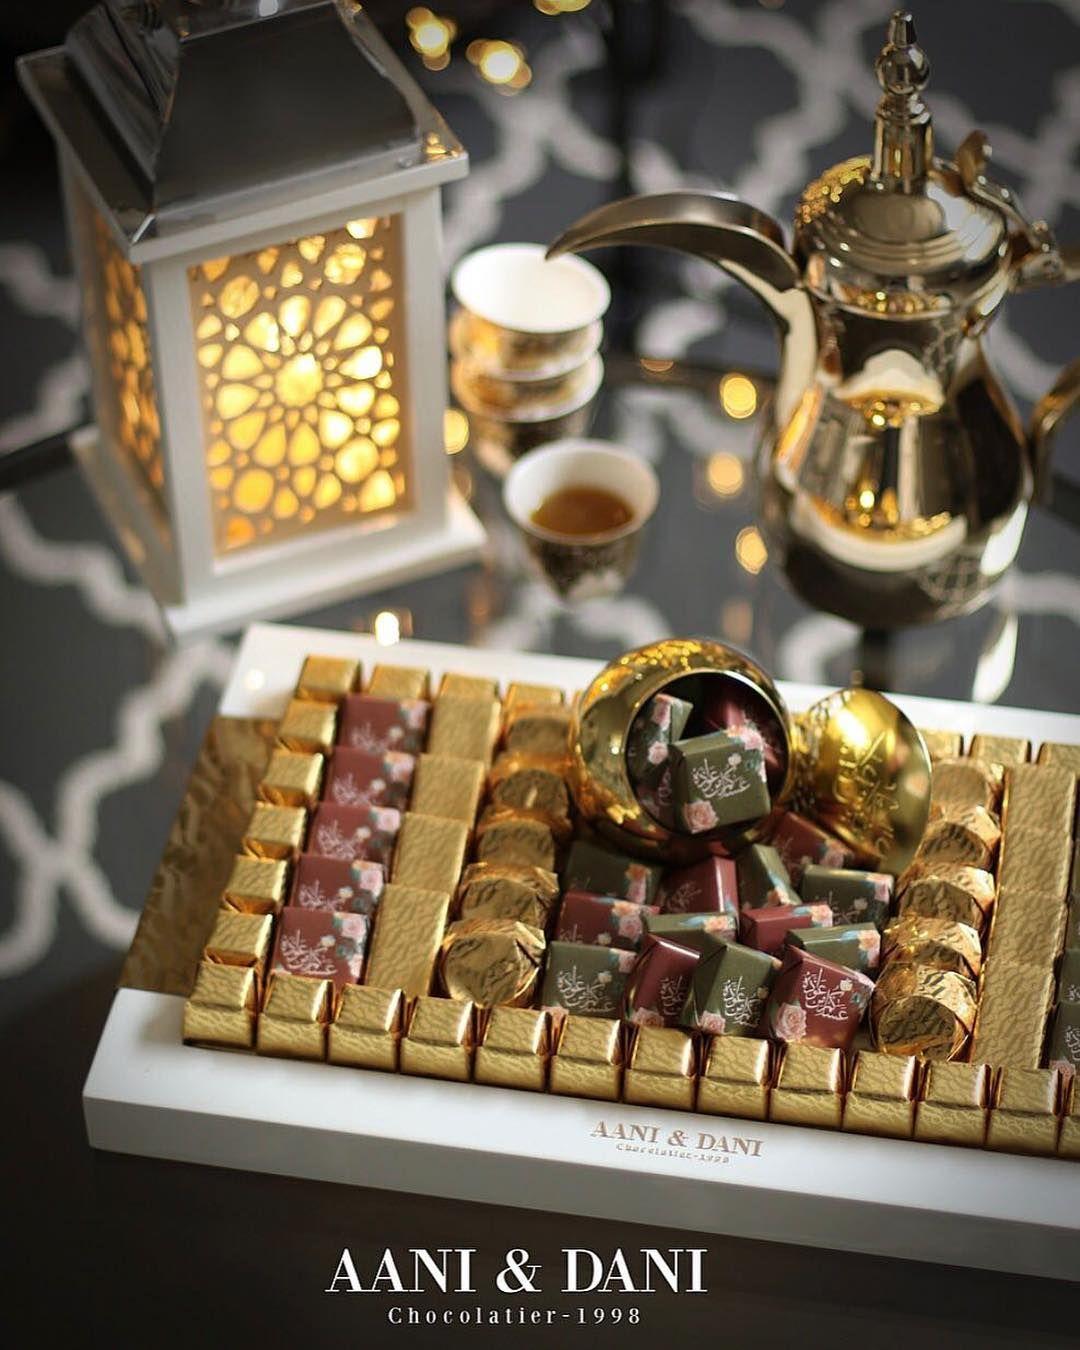 اني وداني تقدم لكم افخم انواع الشكولاته لاعيادكم Aanidani اني وداني تسلم يدك رمضان كريم Table Decorations Decor New Homes